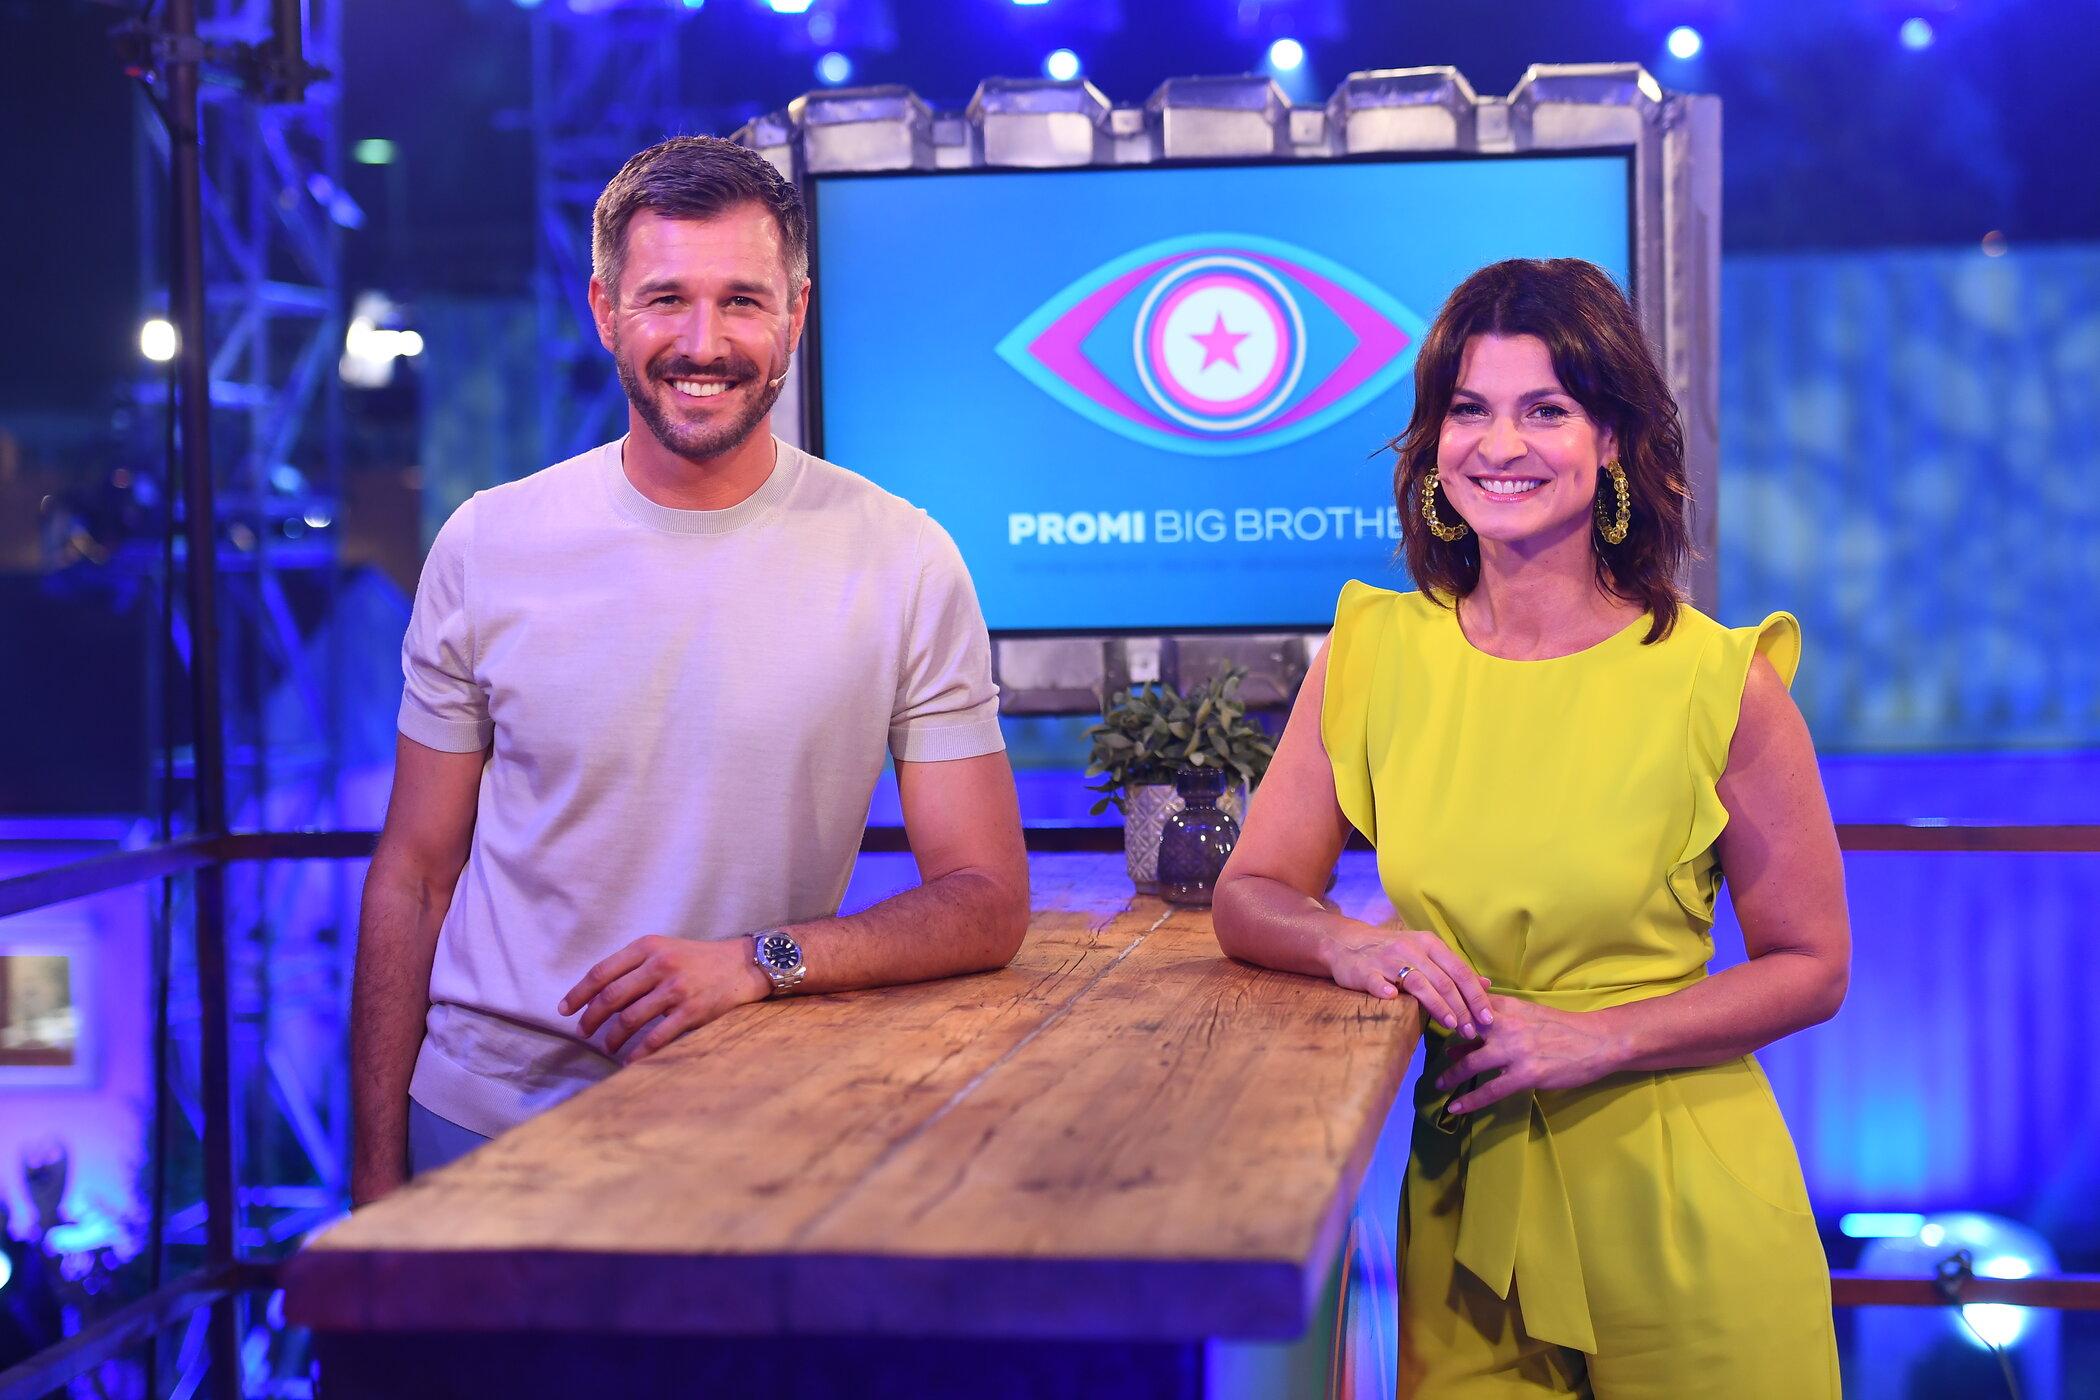 Promi Big Brother 2020 Nachruecker Ersatzkandidat